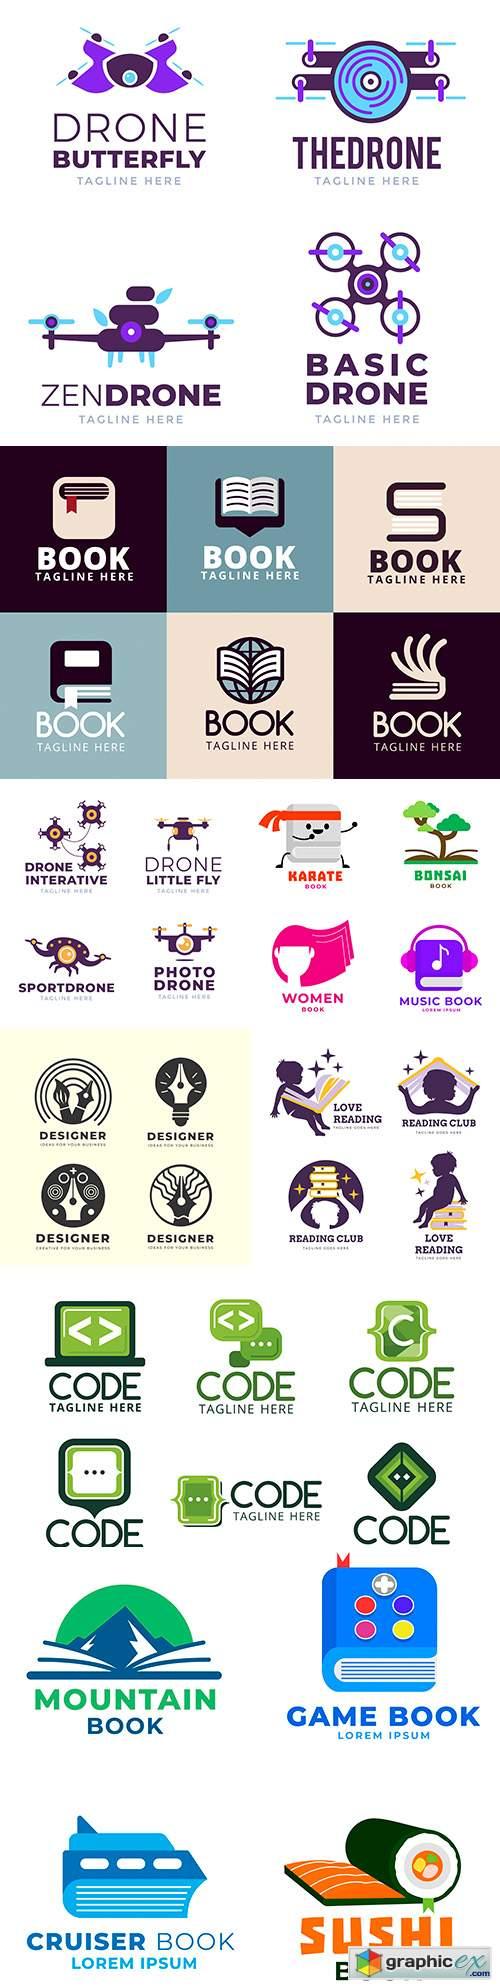 Brand name company business corporate logos design